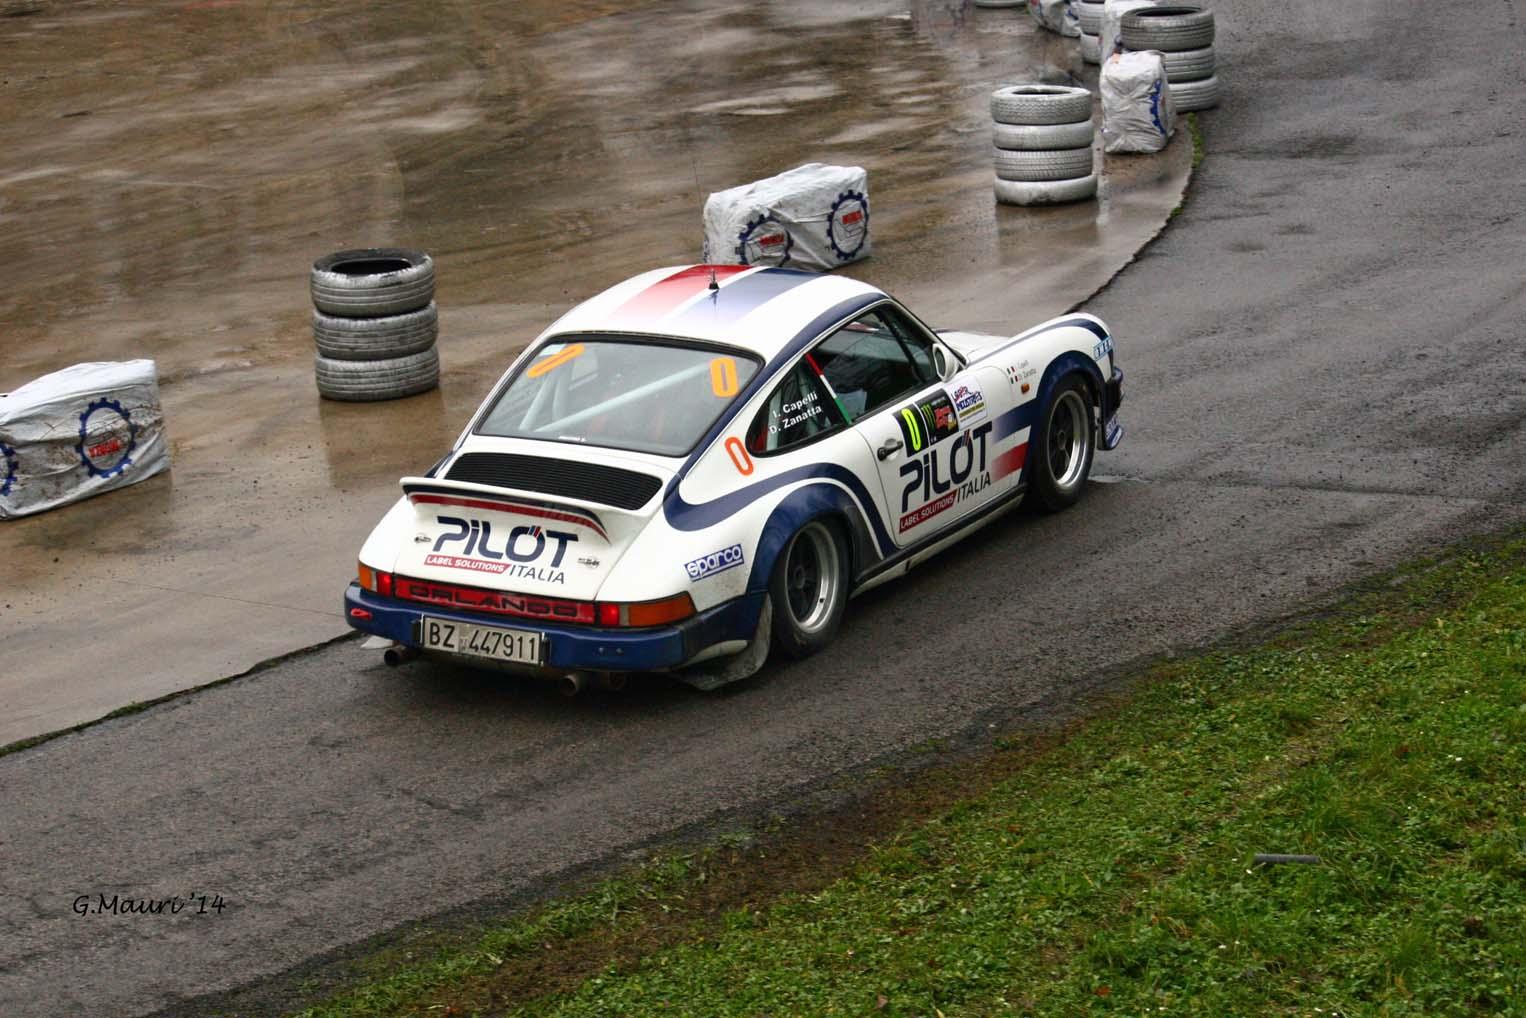 Ivan Capelli // Porsche vettura apripista